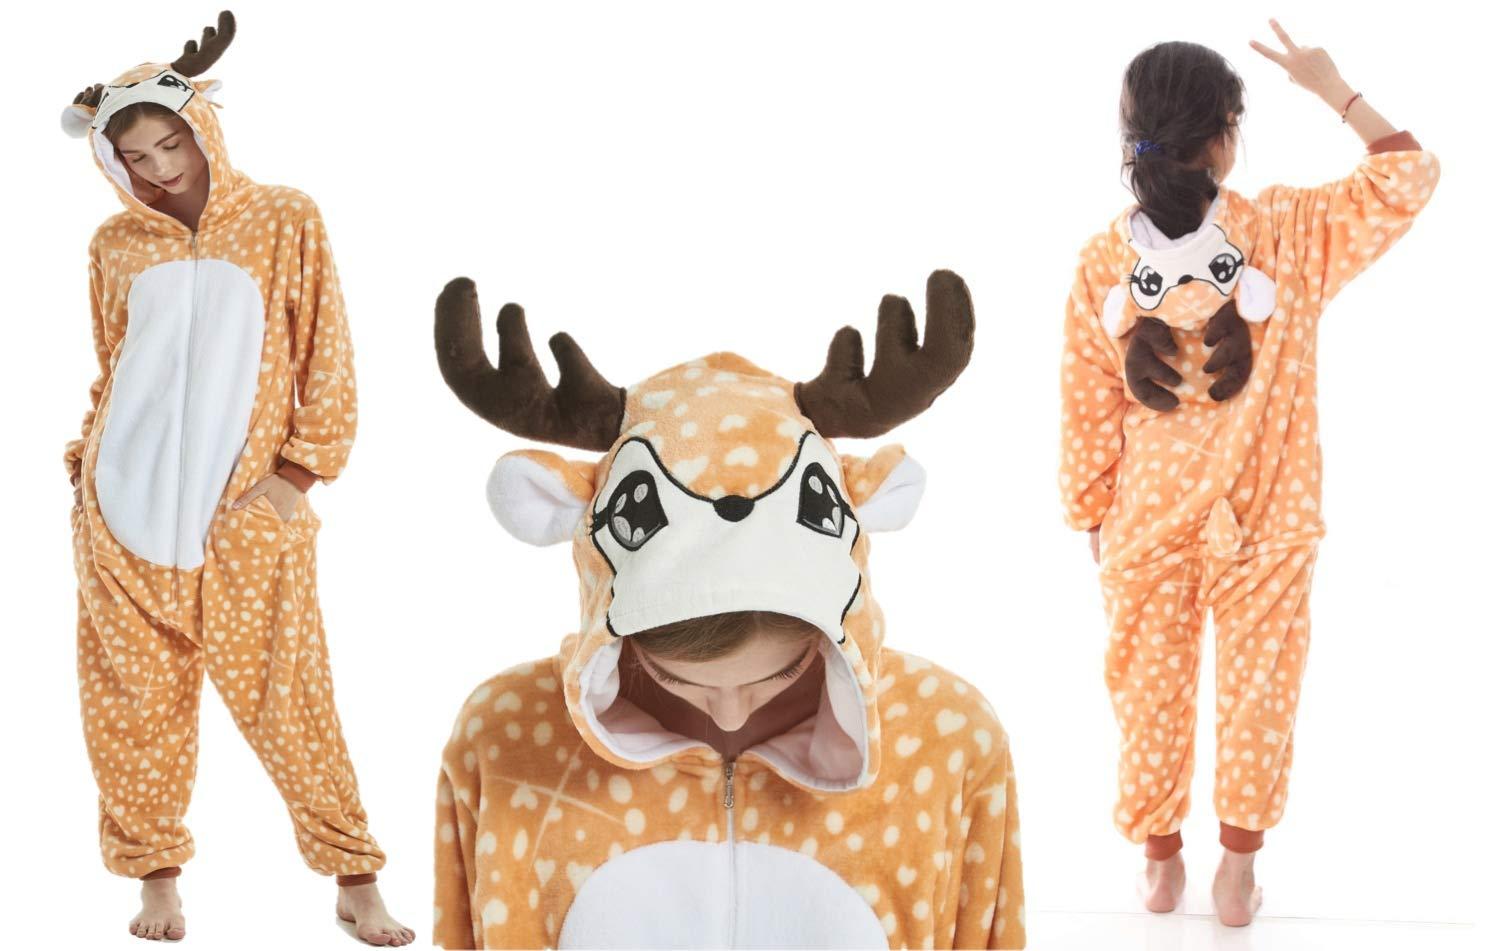 stella arcobaleno blu viola bianco Unicorn Panda Cat renna giraffa mucca corno bambini Onesie ragazze costume costume costume loungewear loungewear ragazze bambini (Età 8-10, Renna) Ecommerce Trade Ltd